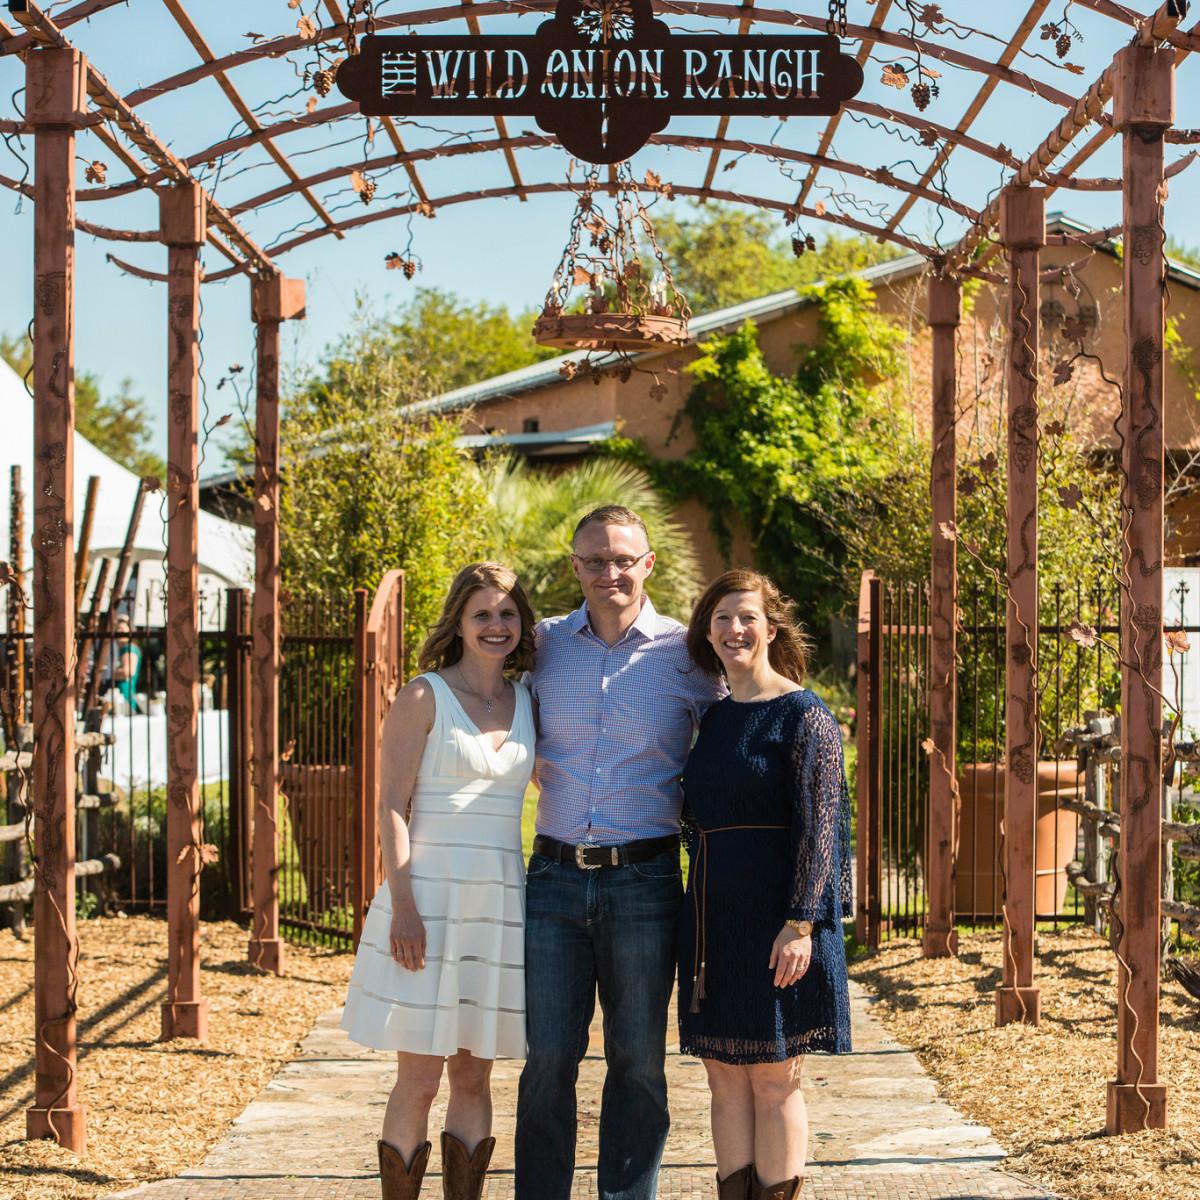 Bandana Ball April 2016 Ronald McDonald House Charities of Central Texas Wild Onion Ranch Alyssa Martin Garret Martin Carolyn Schwarz